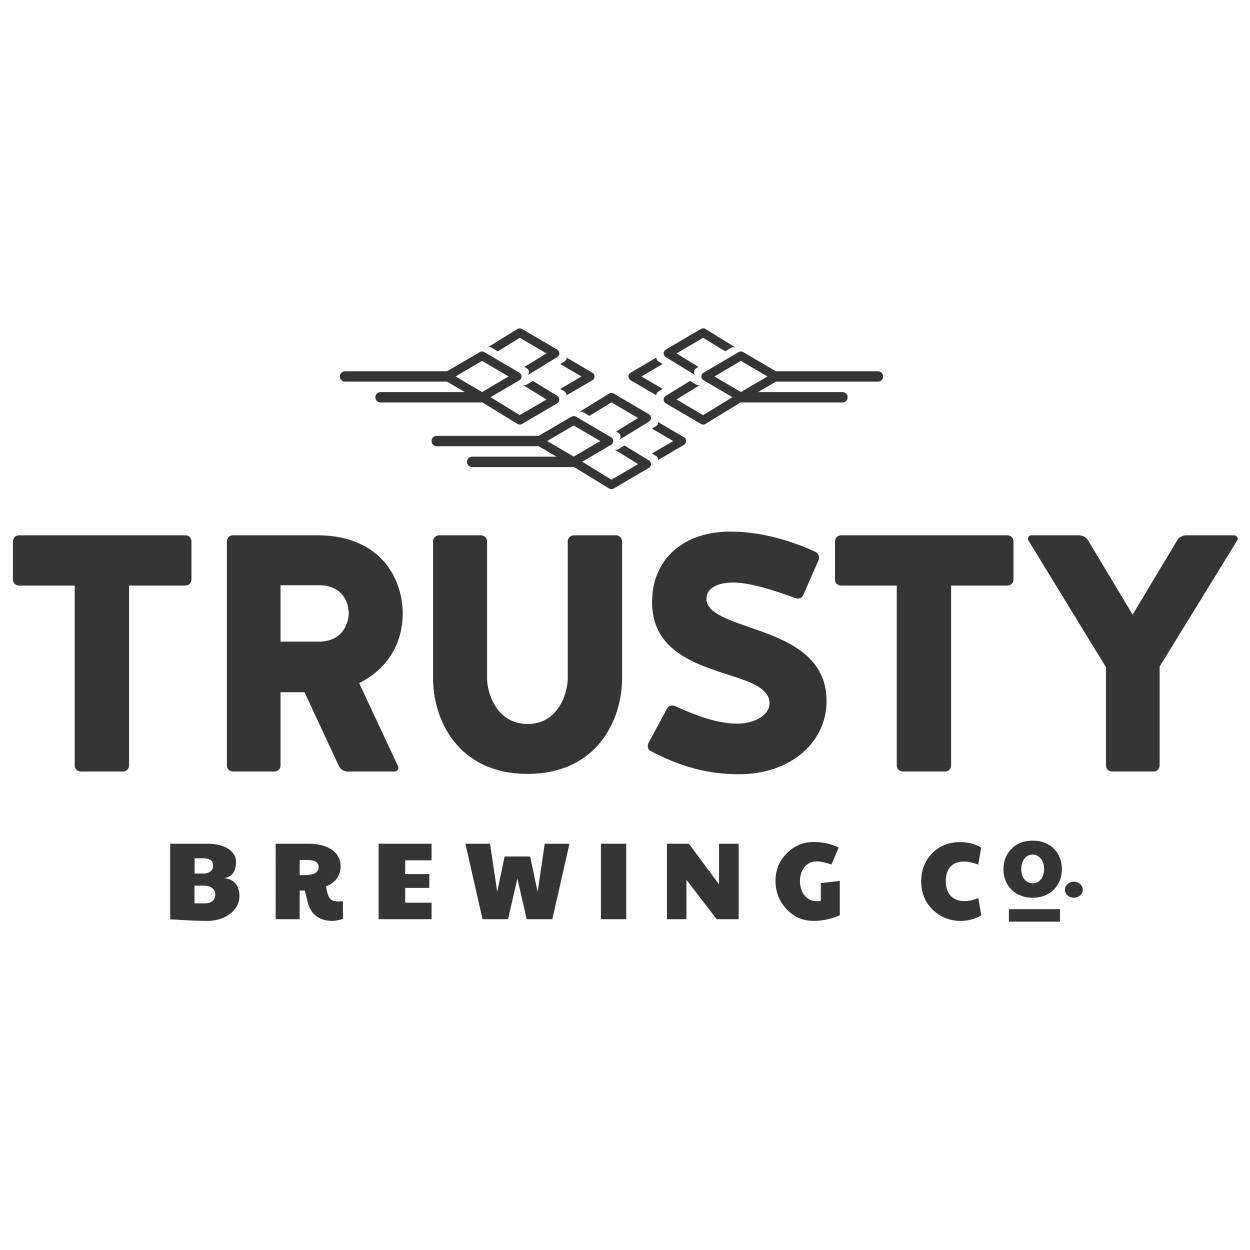 Trusty Brewing Company